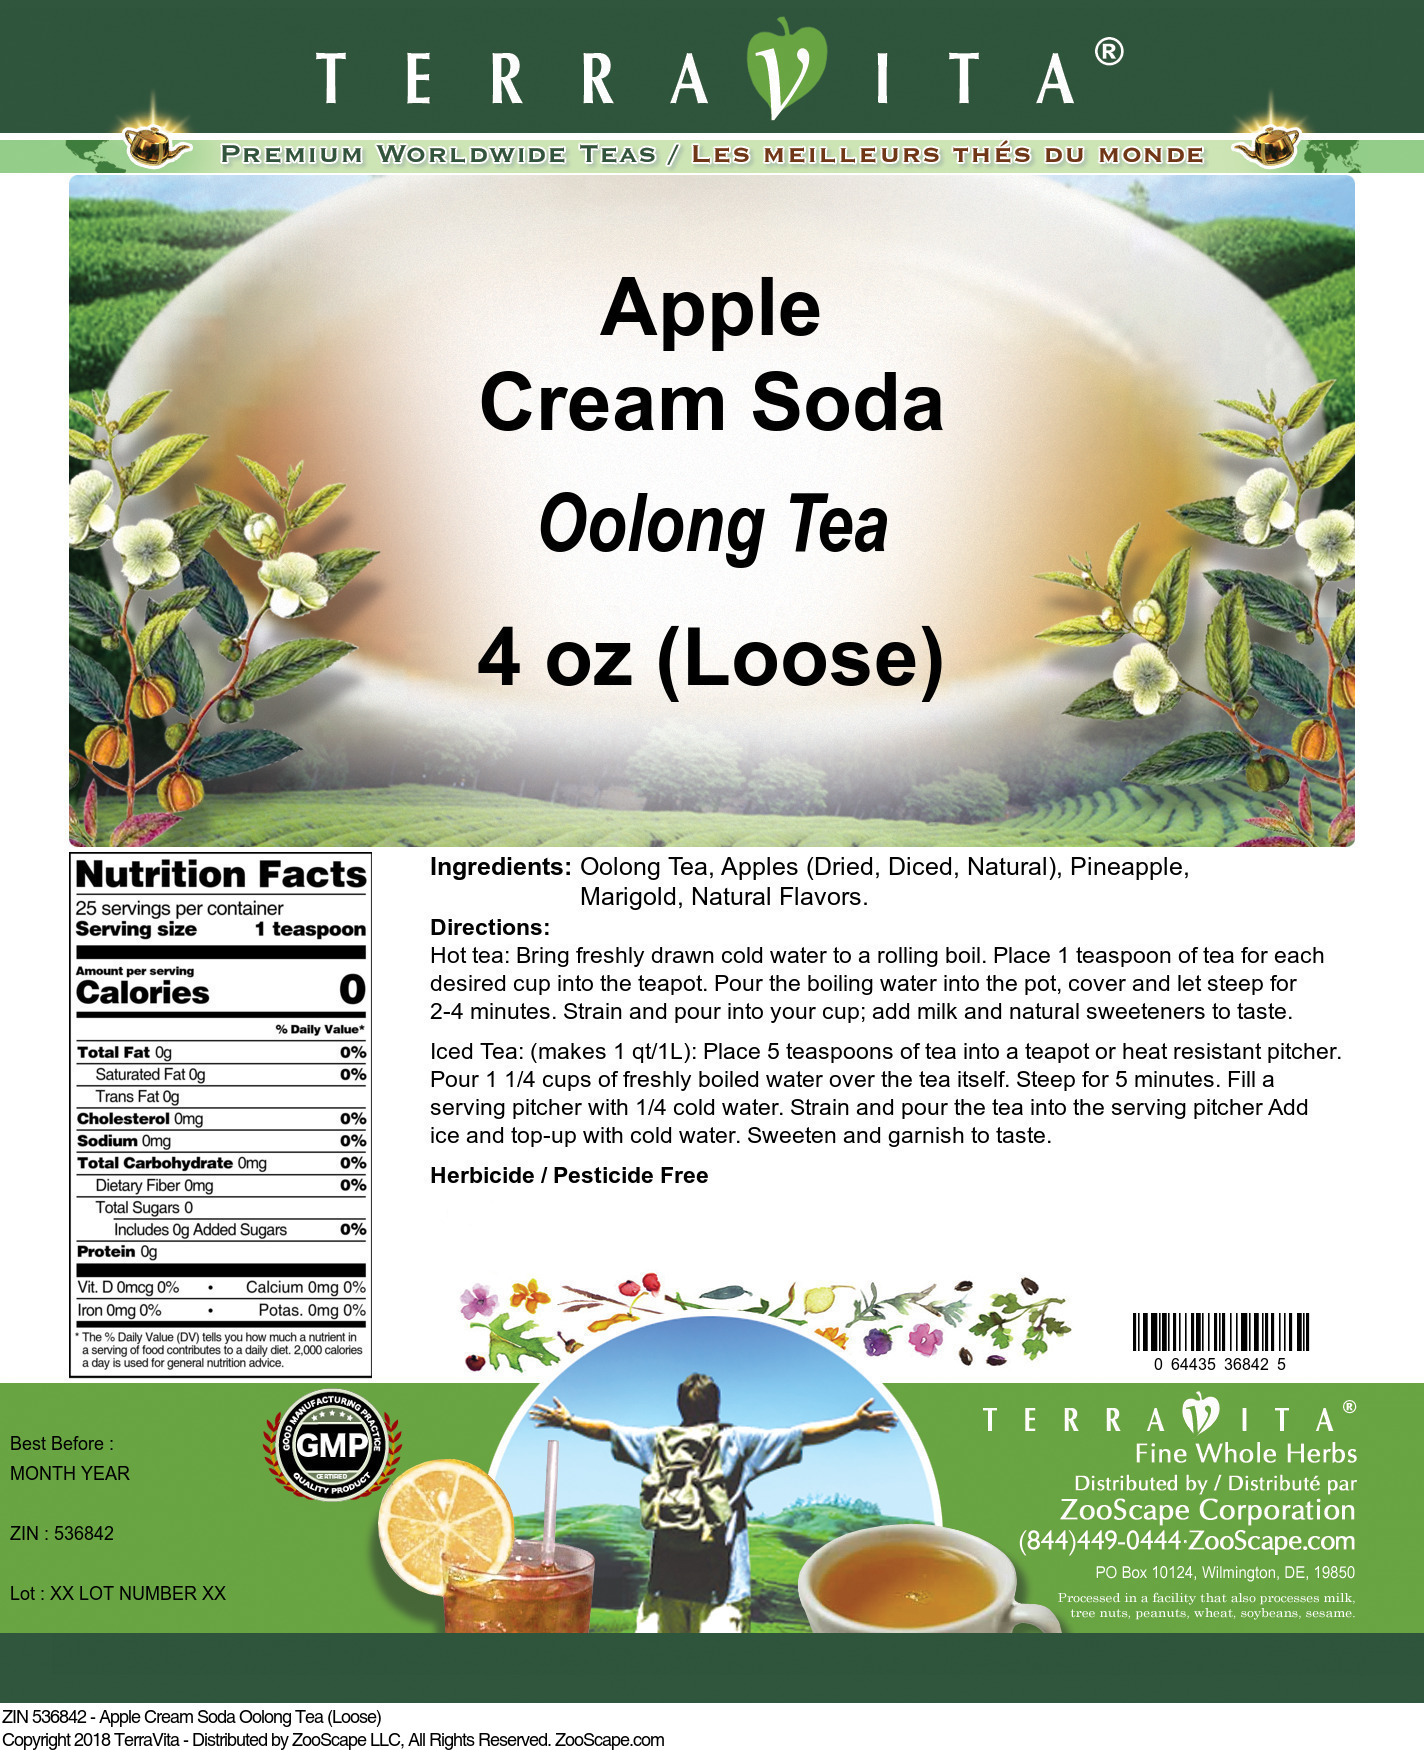 Apple Cream Soda Oolong Tea (Loose)